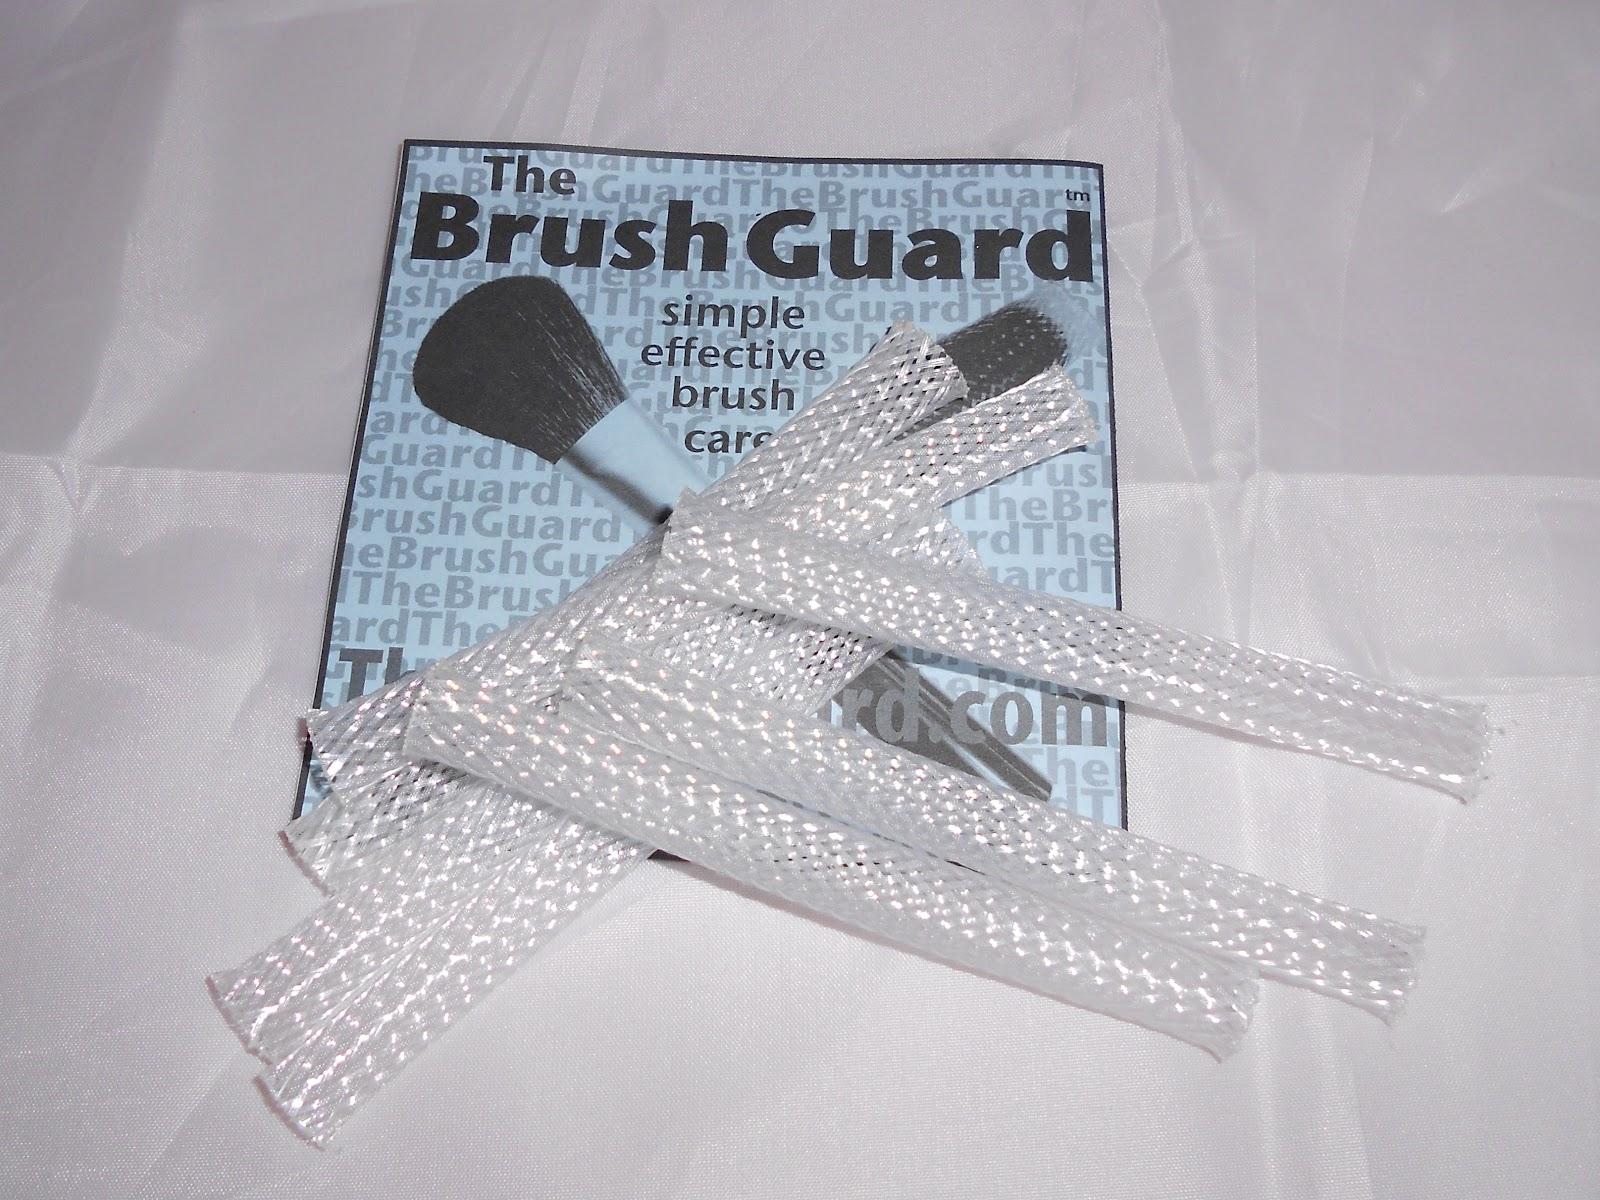 The Brush Guard